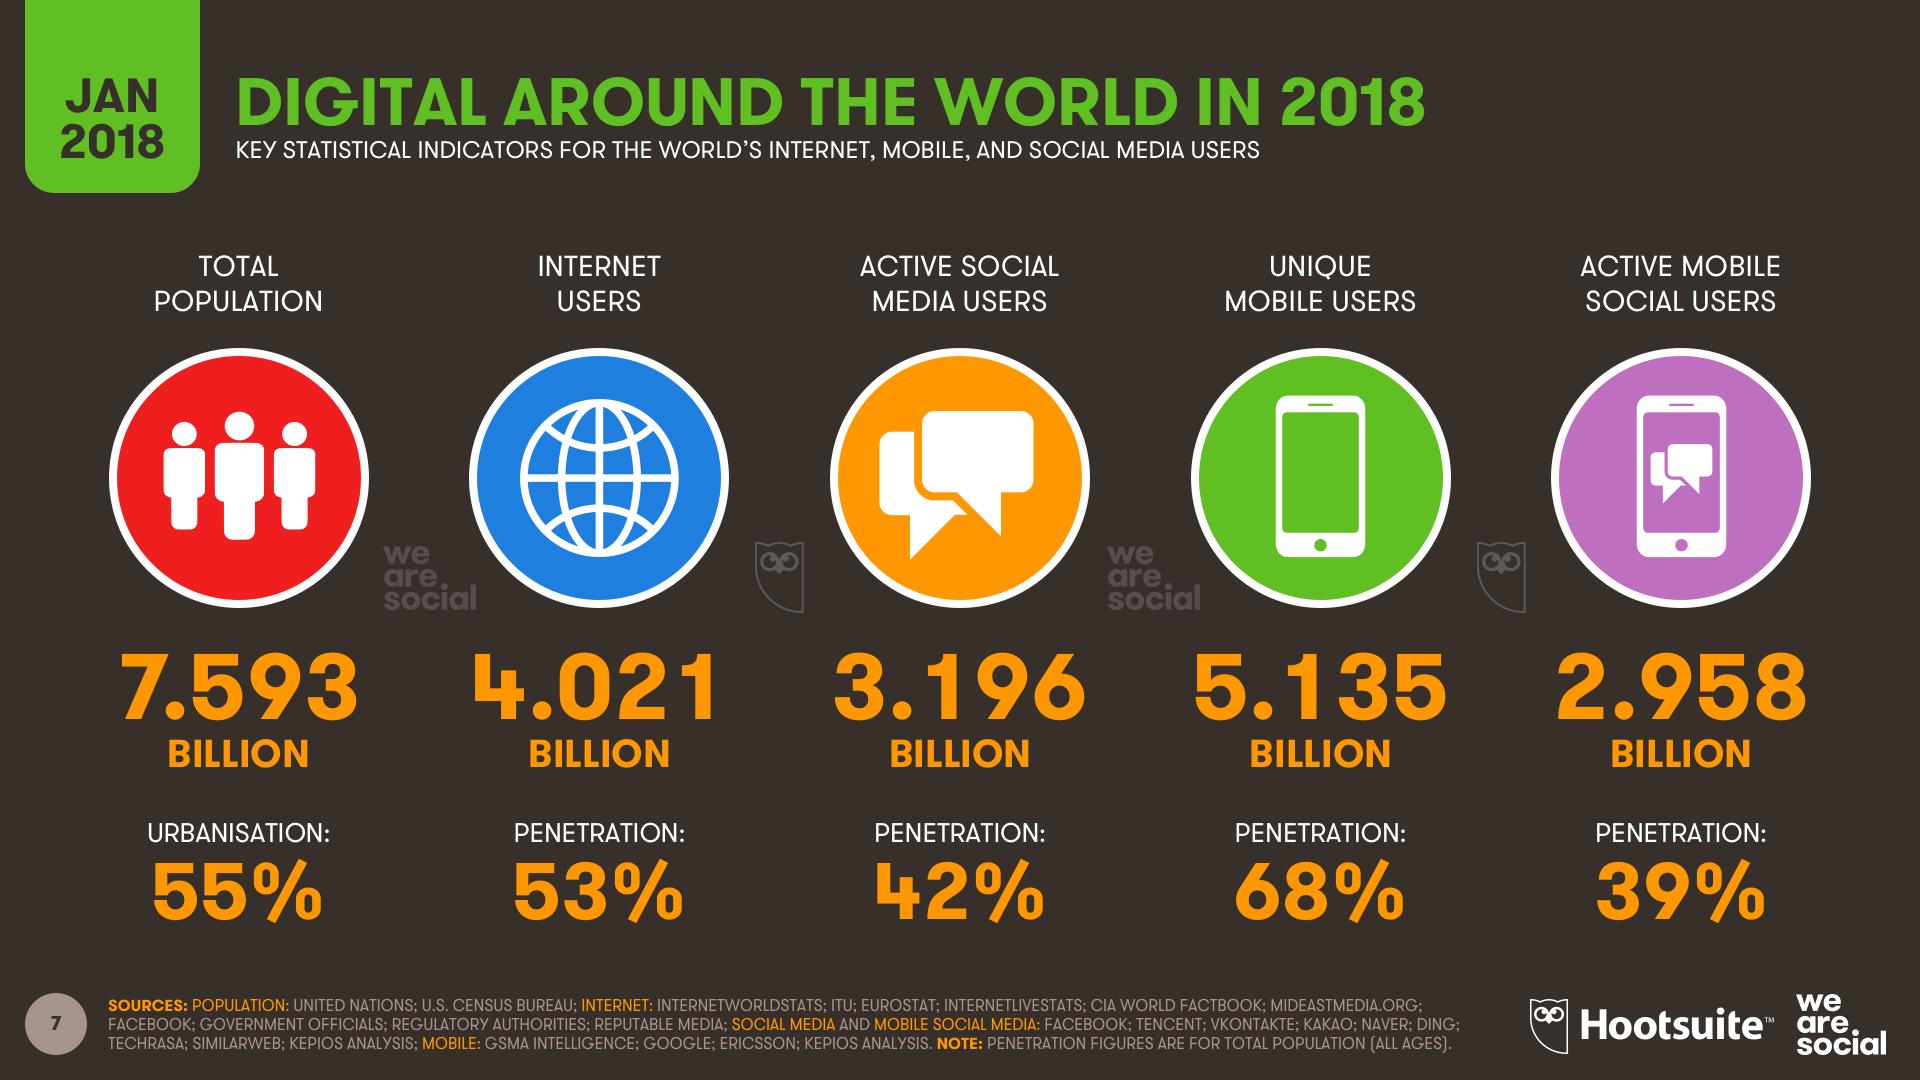 Digital world in 2018